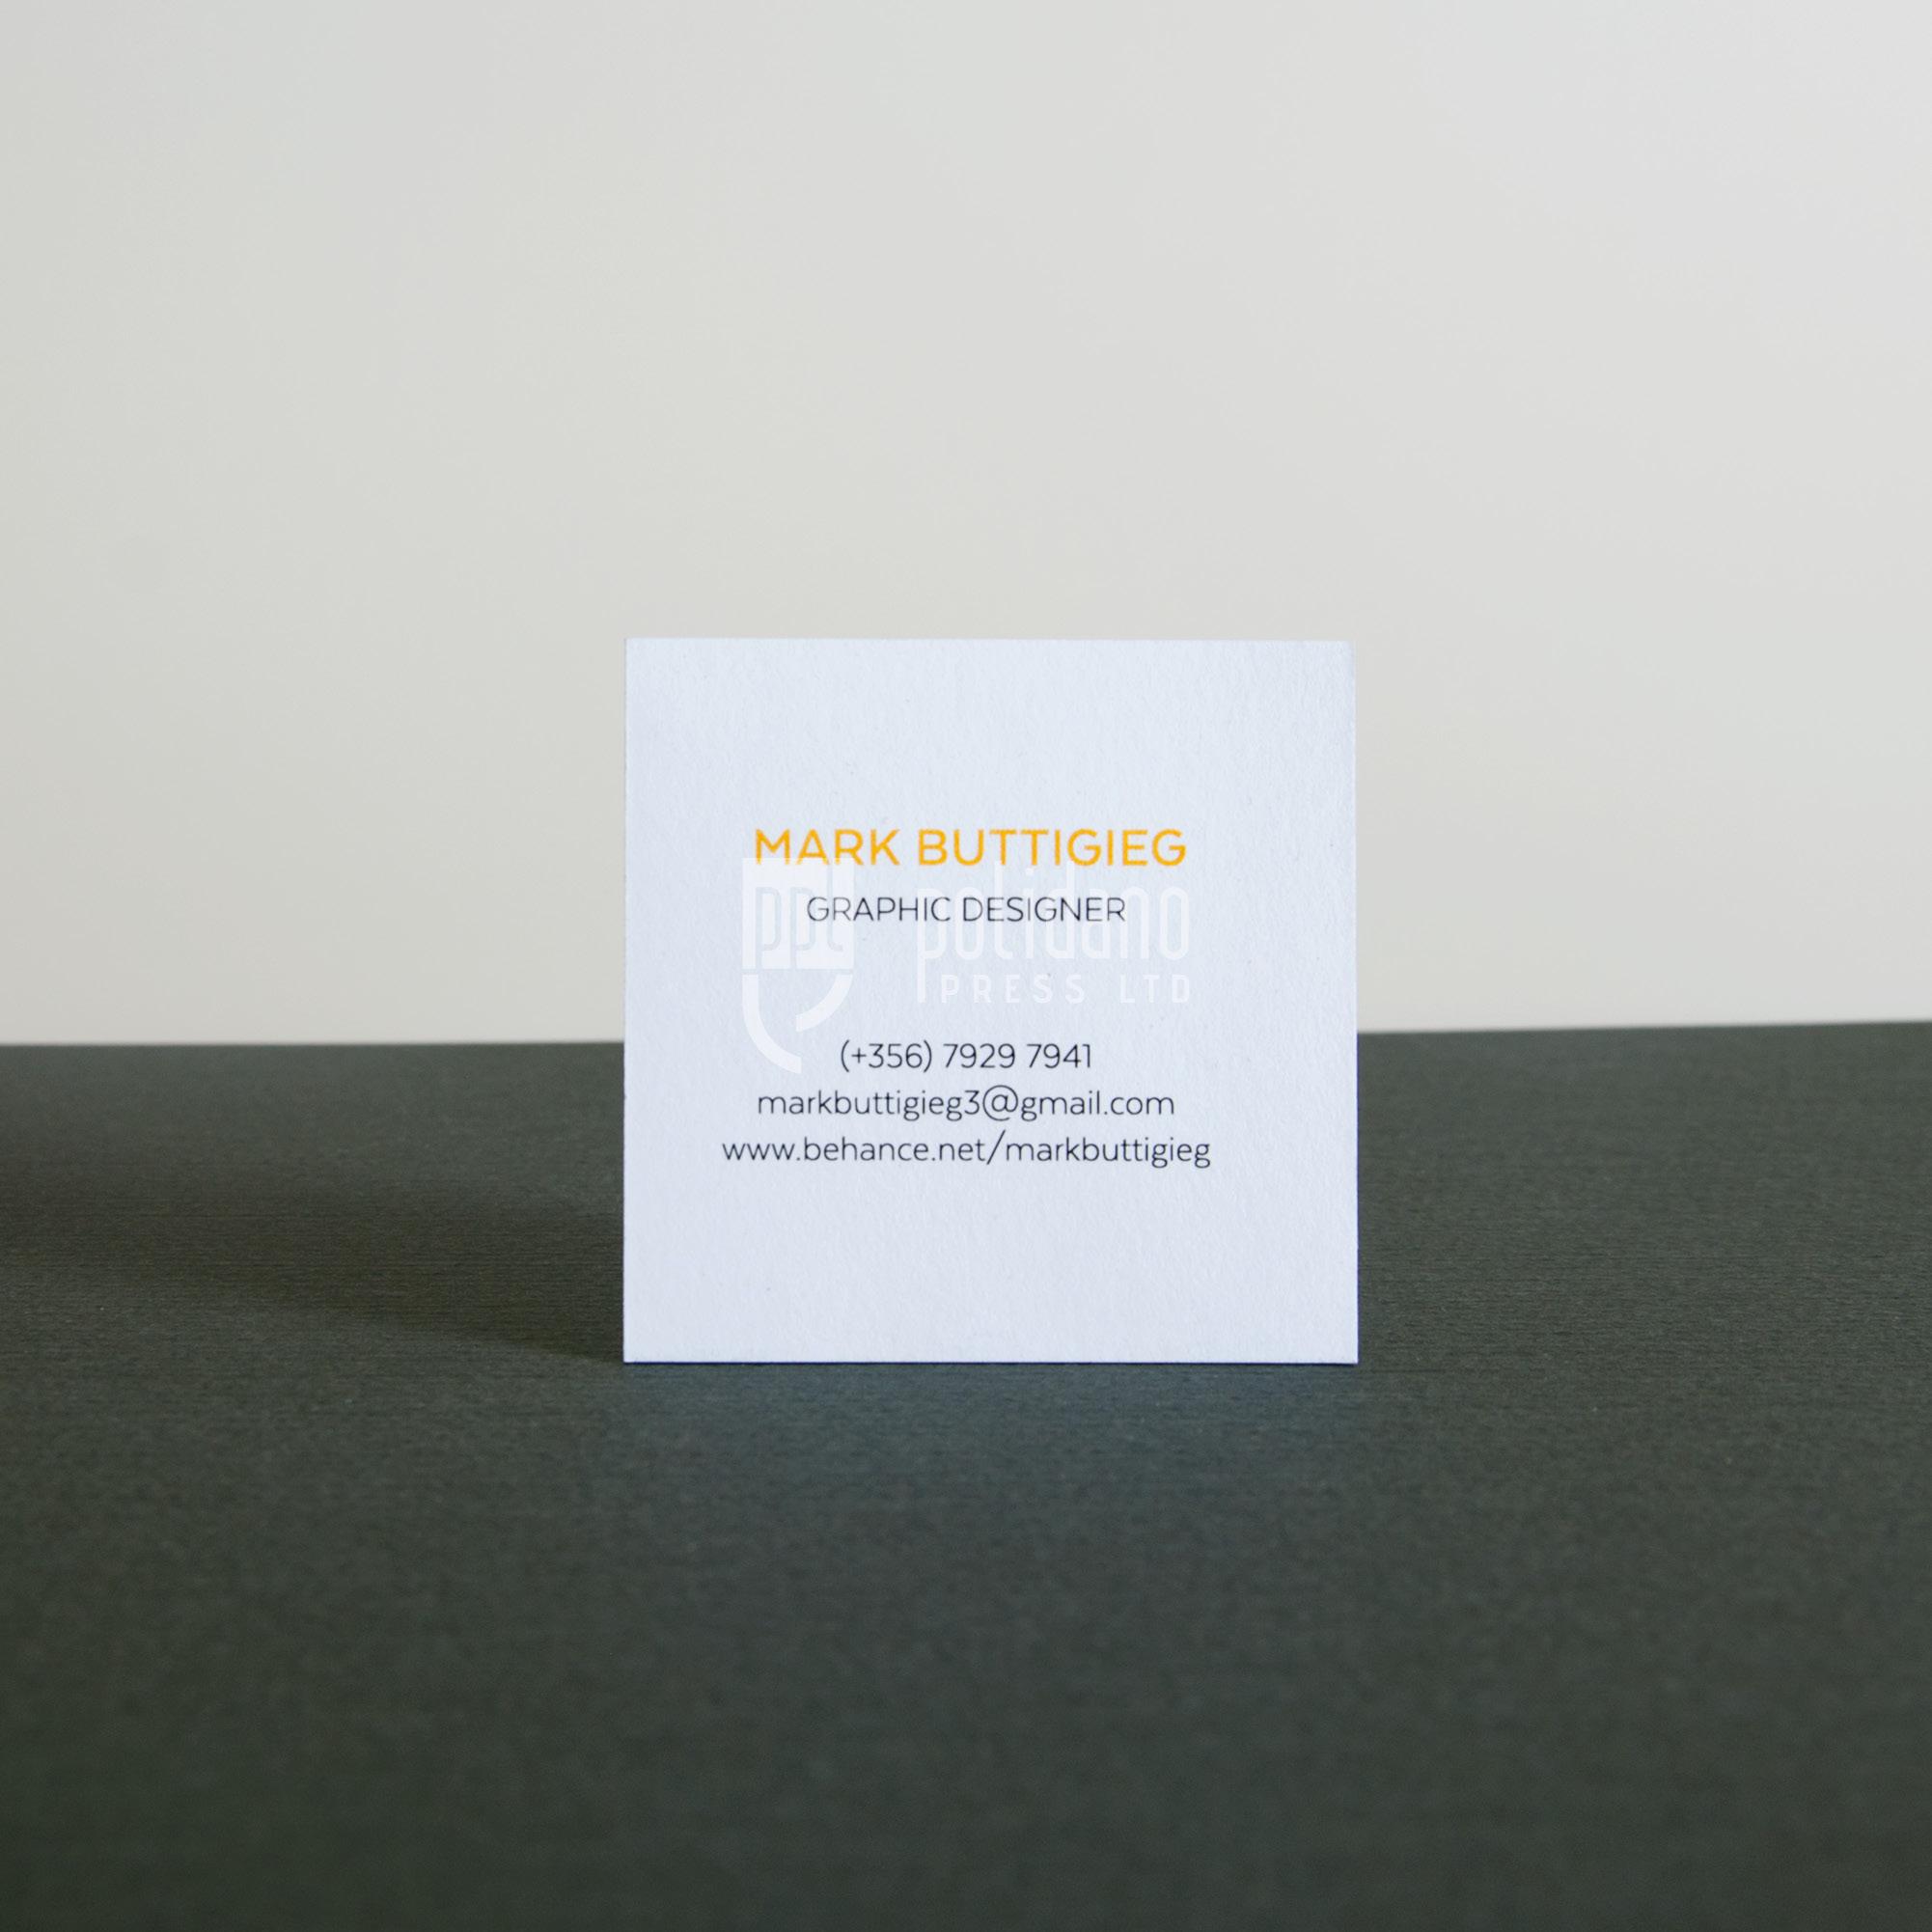 Mark Buttigieg business cards